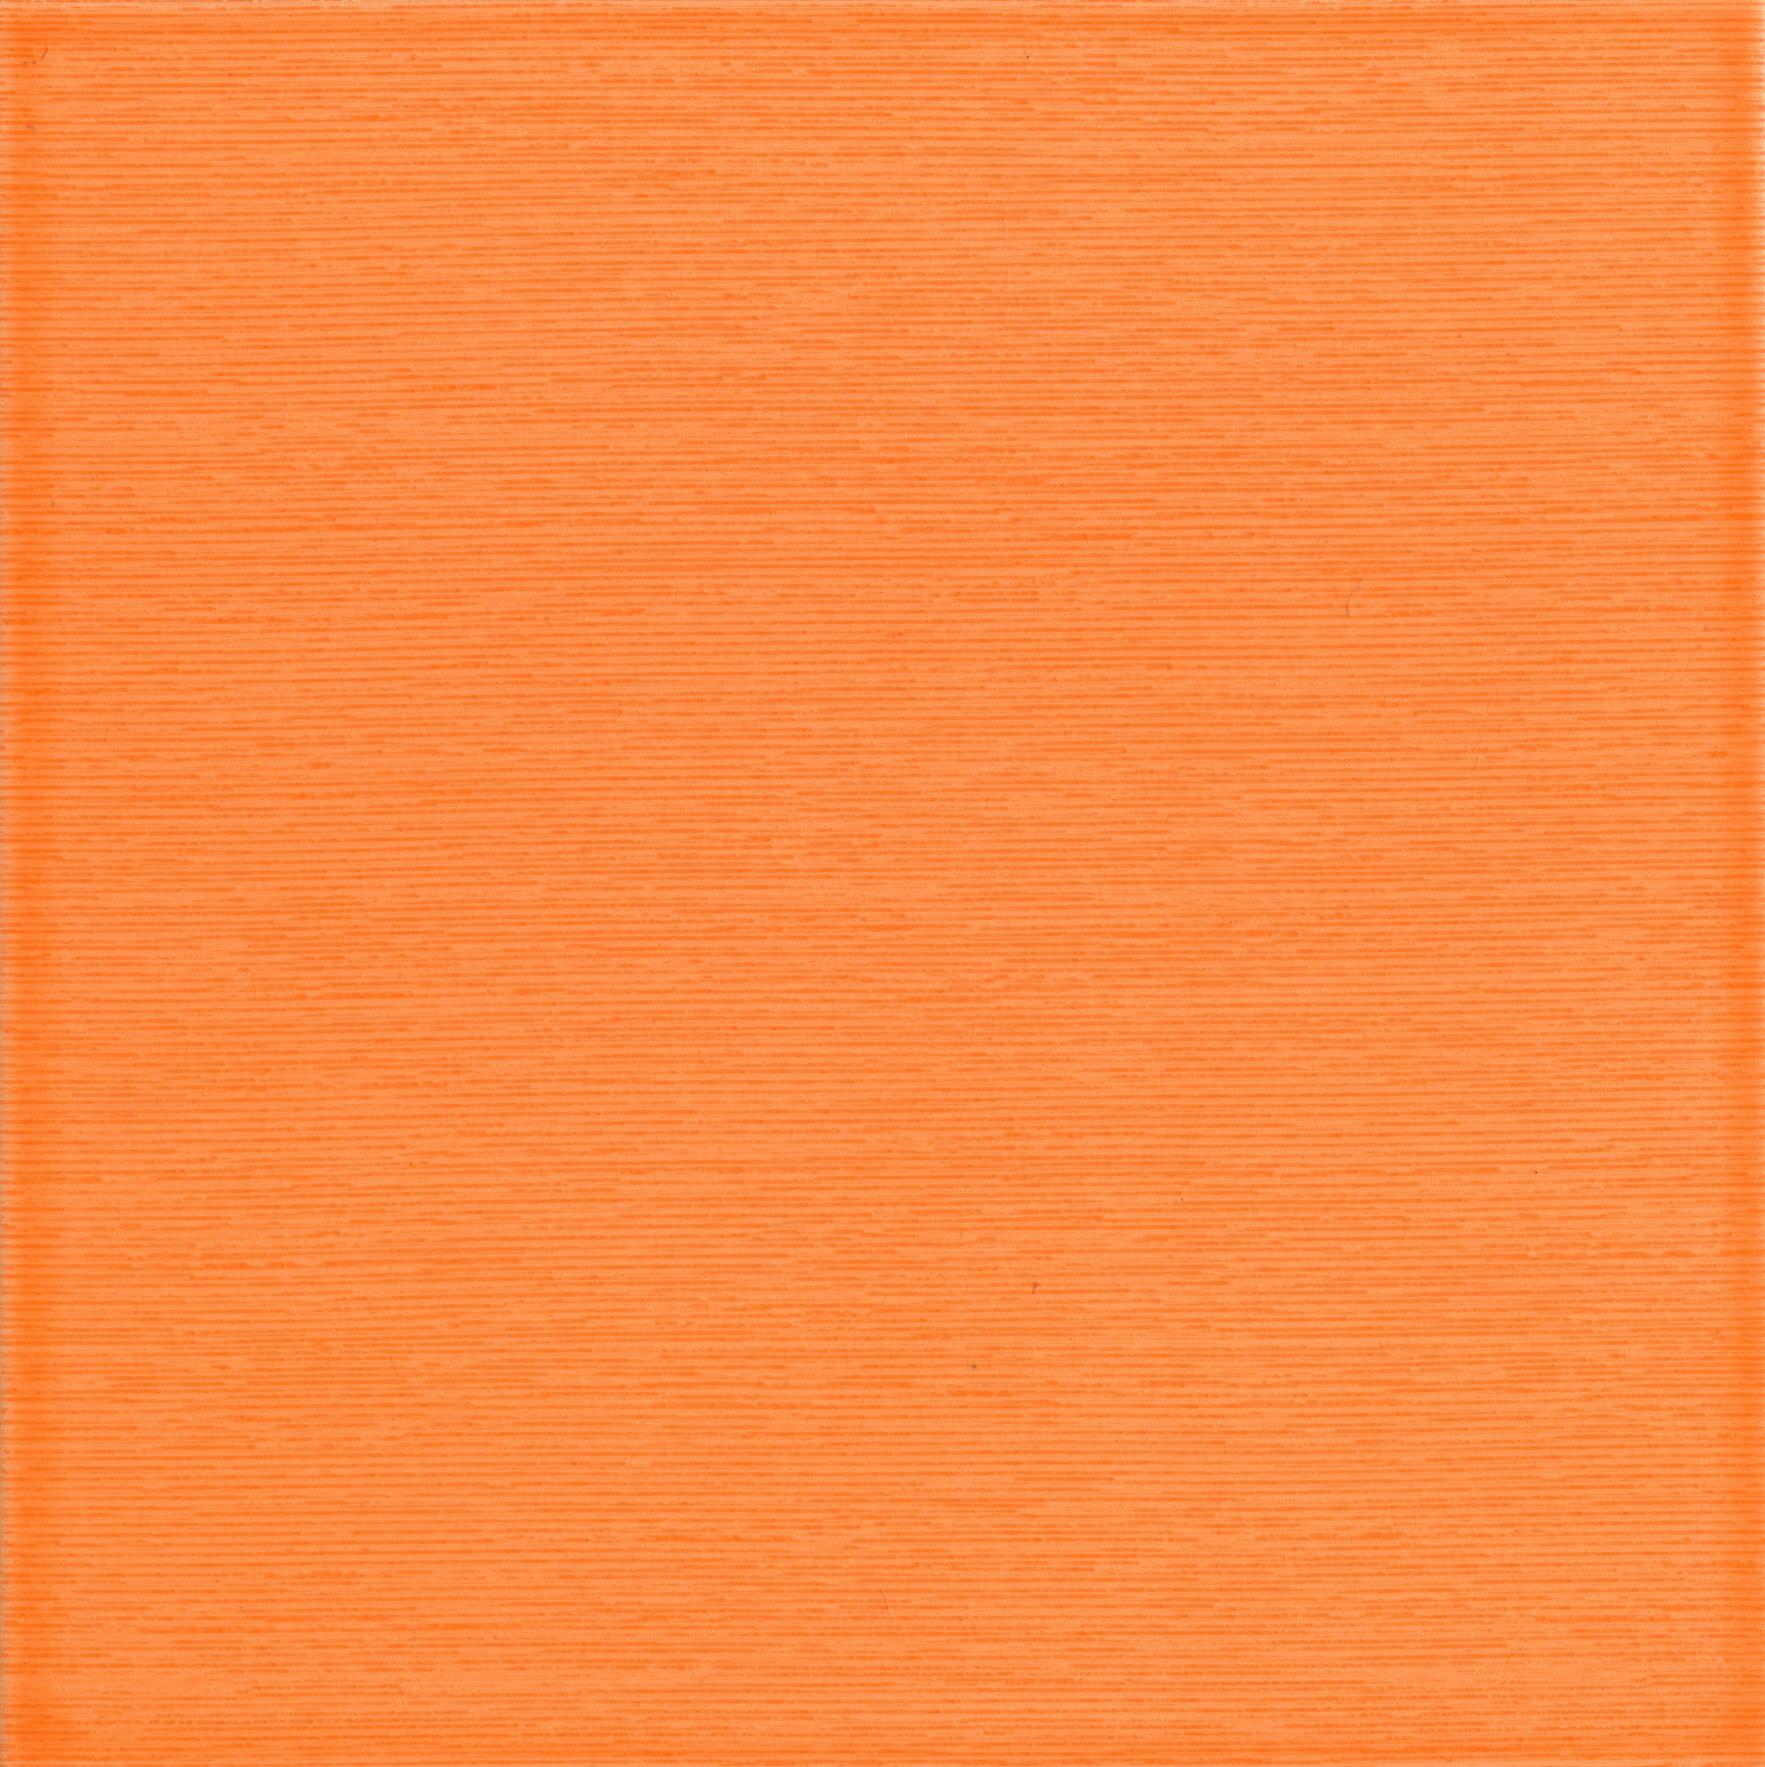 Laura напольная плитка (оранжевая), 30х30